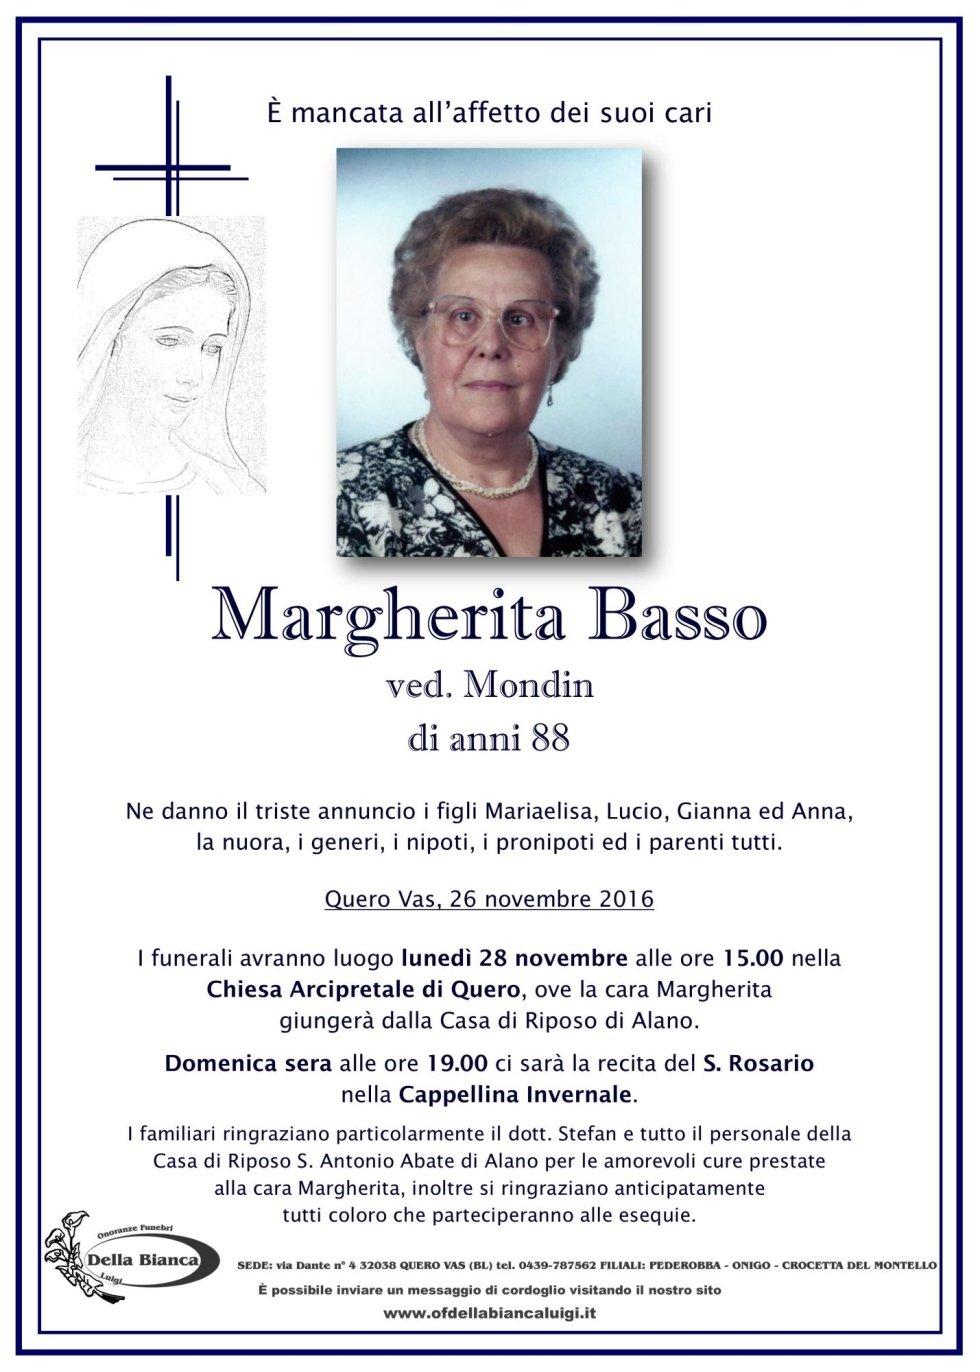 Basso Margherita